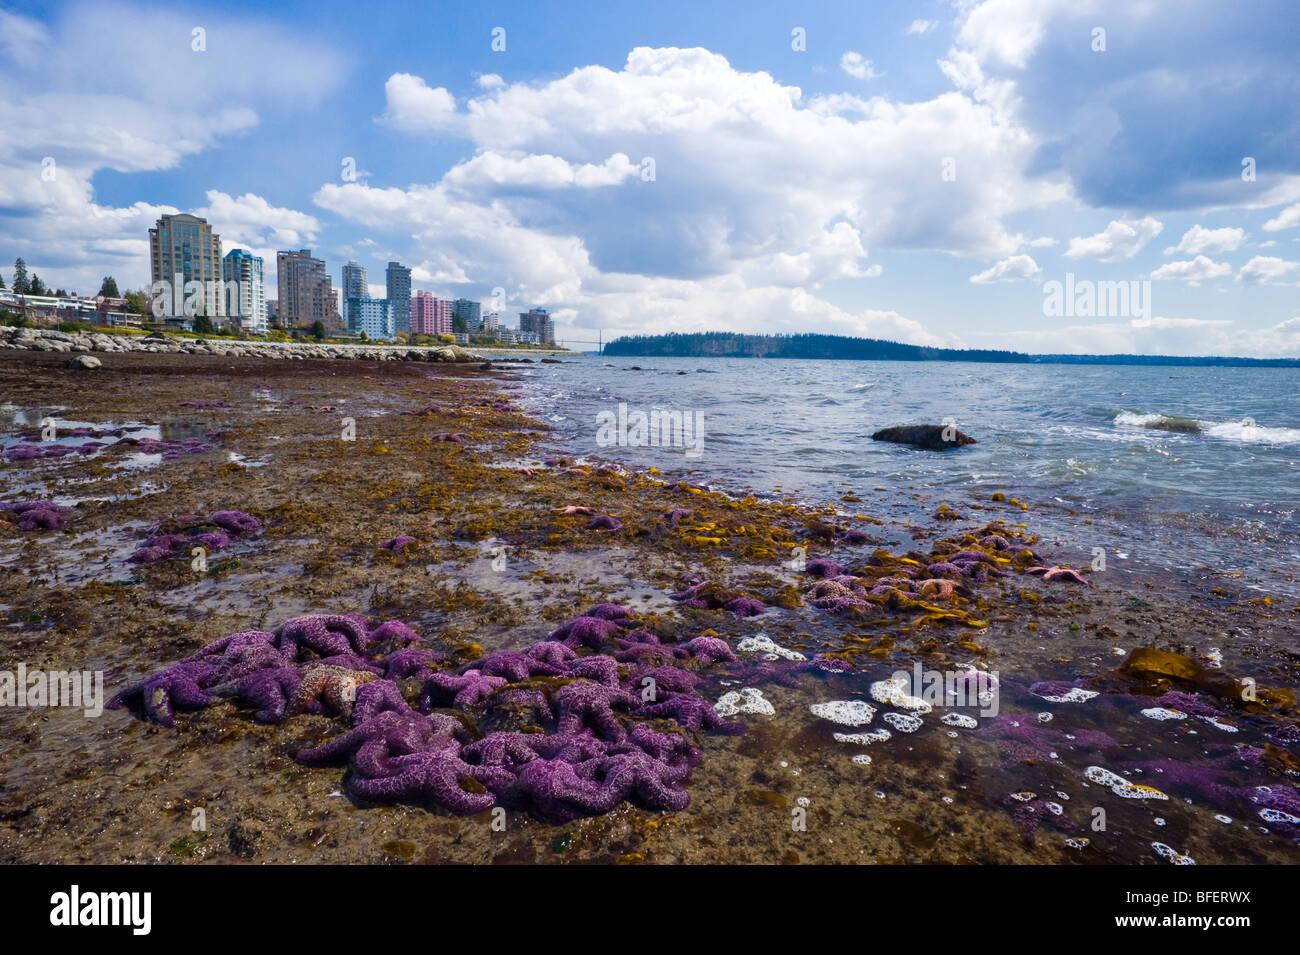 Purple starfish on the beach, West Vancouver, British Columbia, Canada - Stock Image